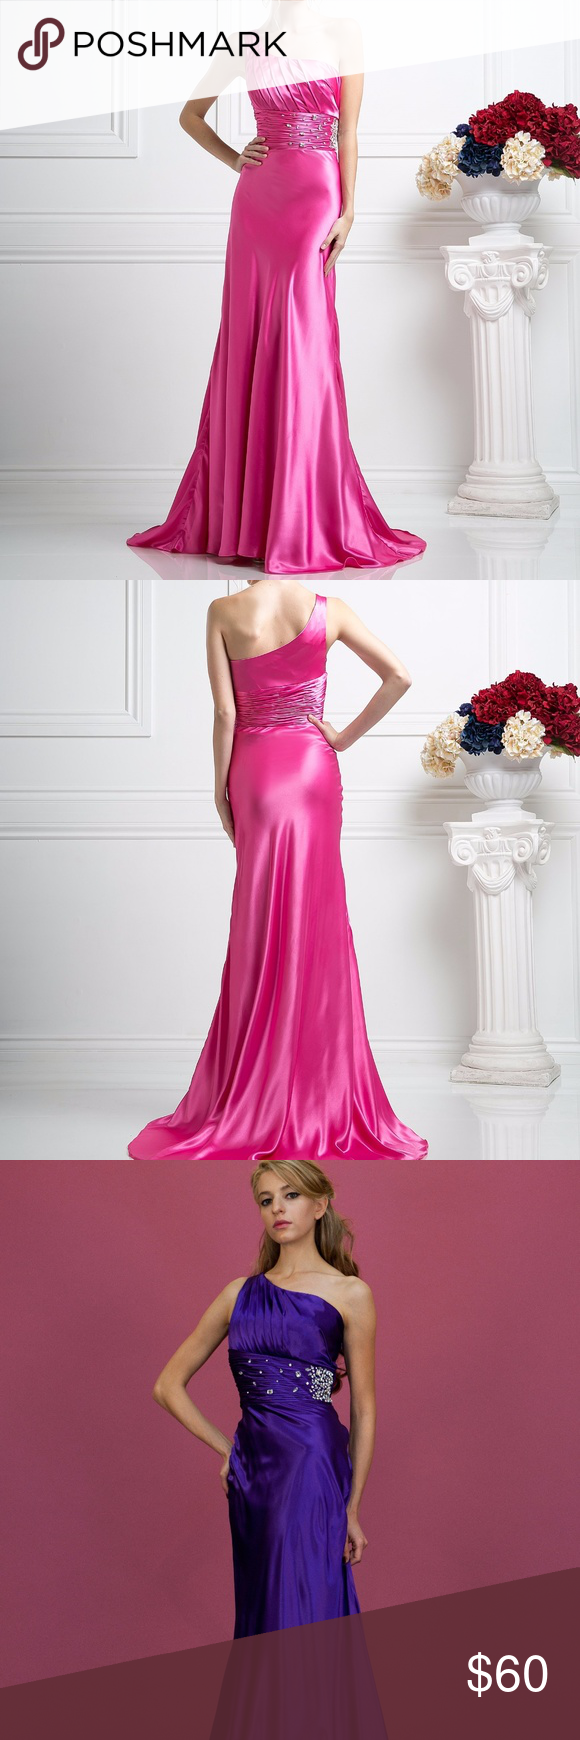 Cinderella Divine - Asymmetric Lace Sheath Evening Dress